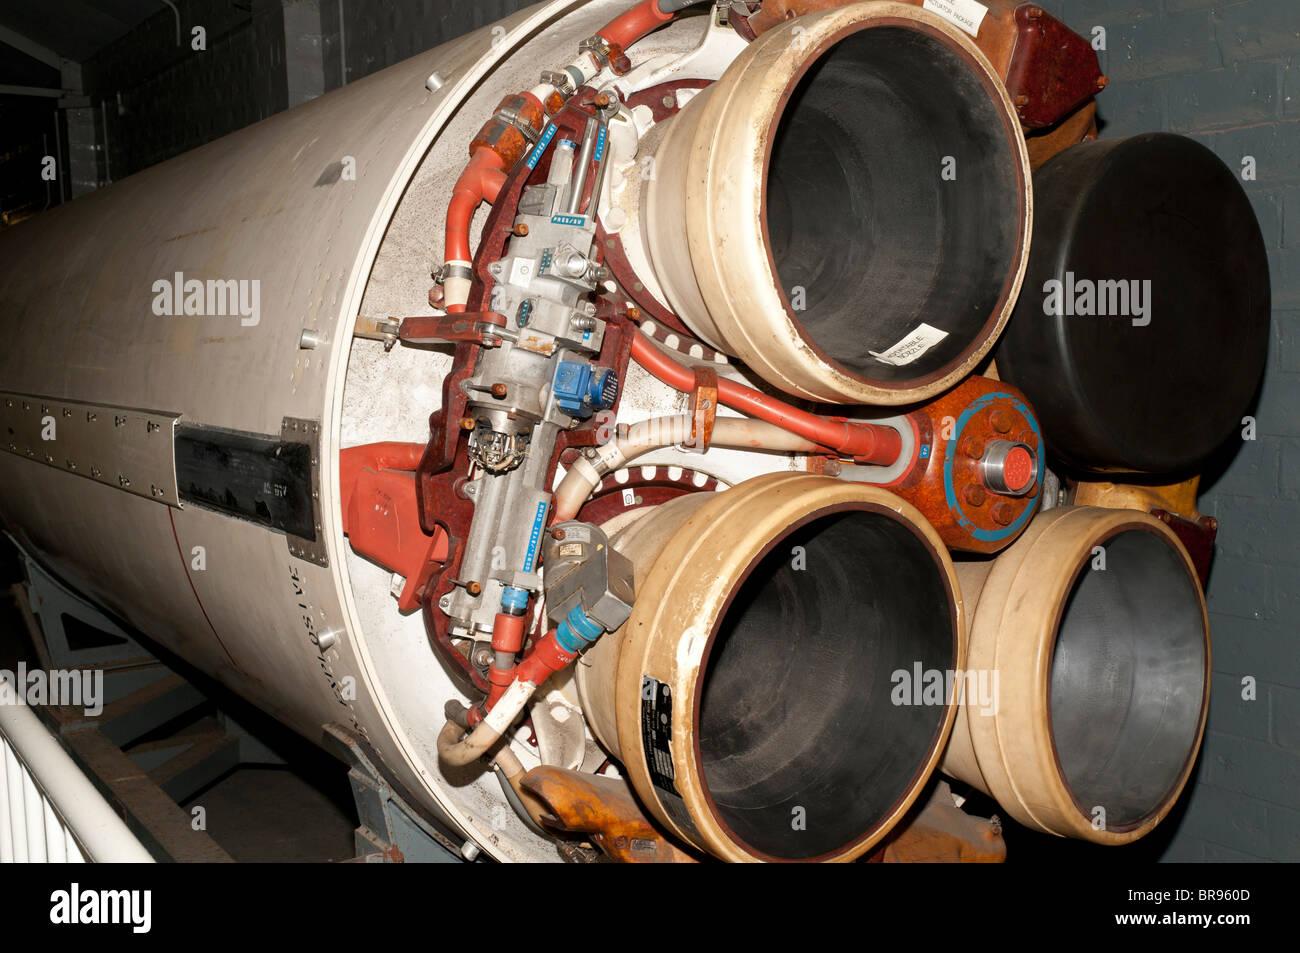 Rocket exhaust nozzles of a Polaris missile, Royal Navy Submarine Museum, Gosport, Portsmouth, UK Stock Photo